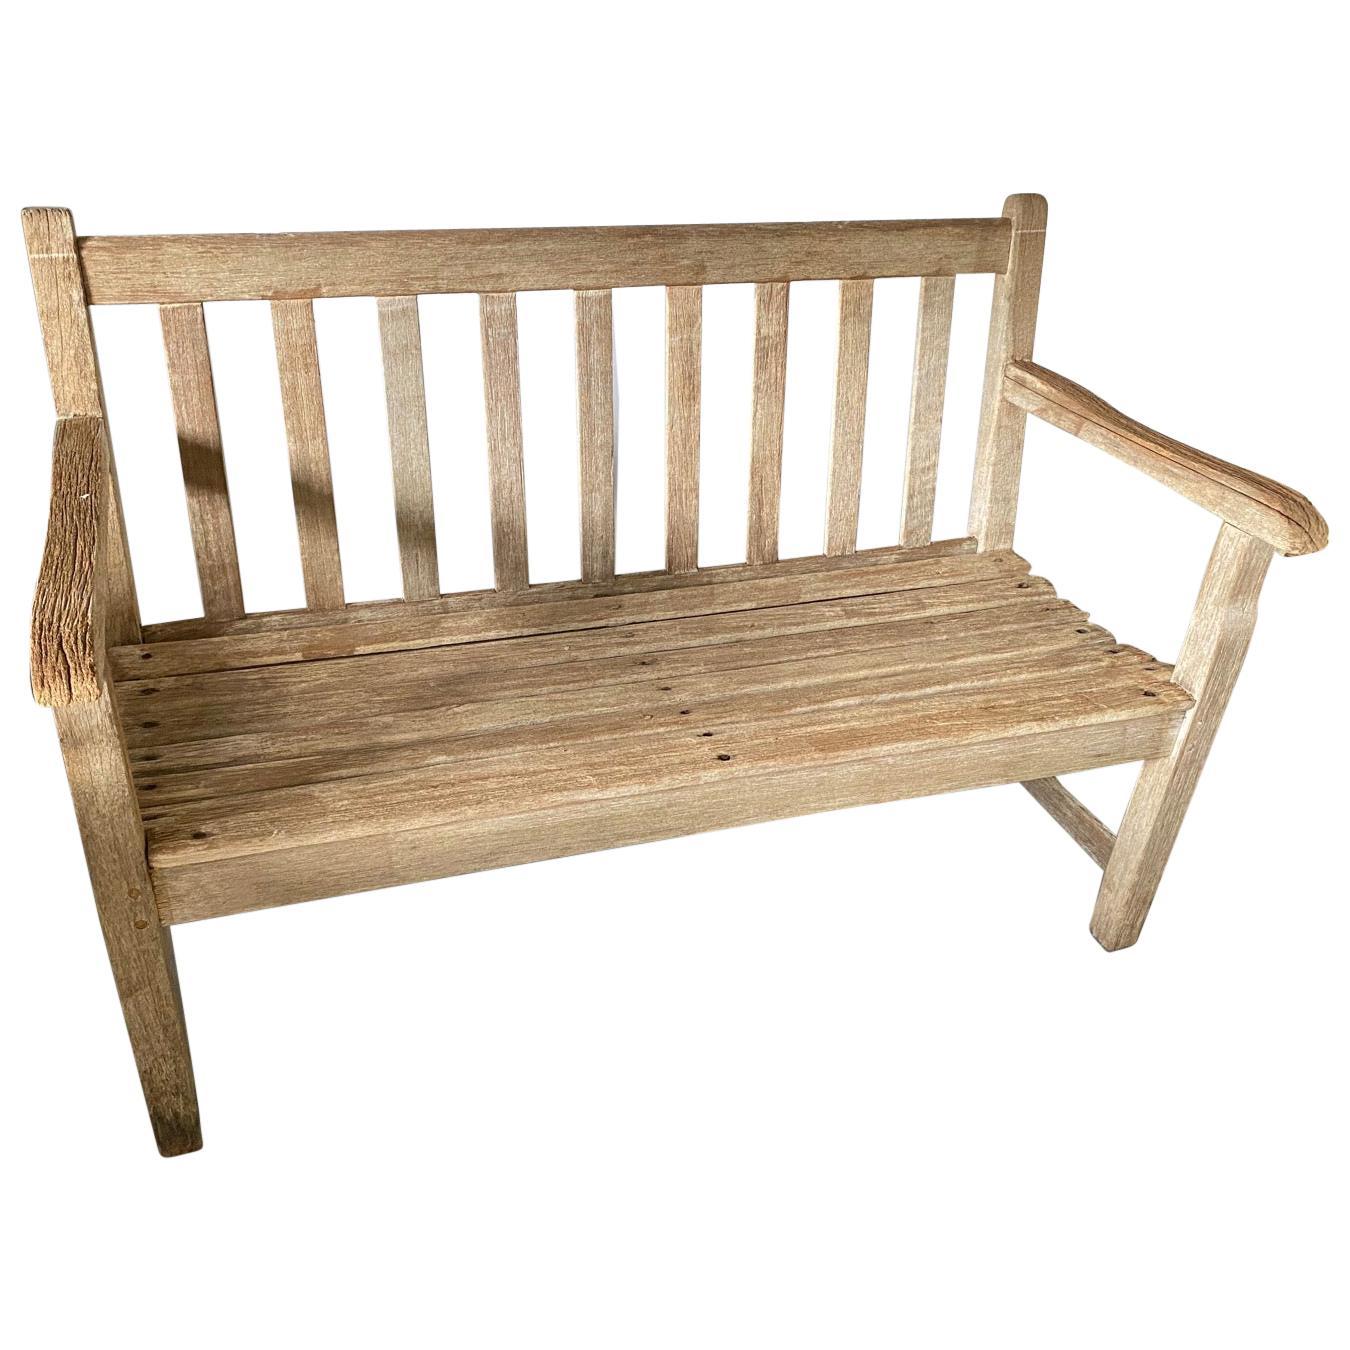 Vintage Teak Garden Bench with Arms